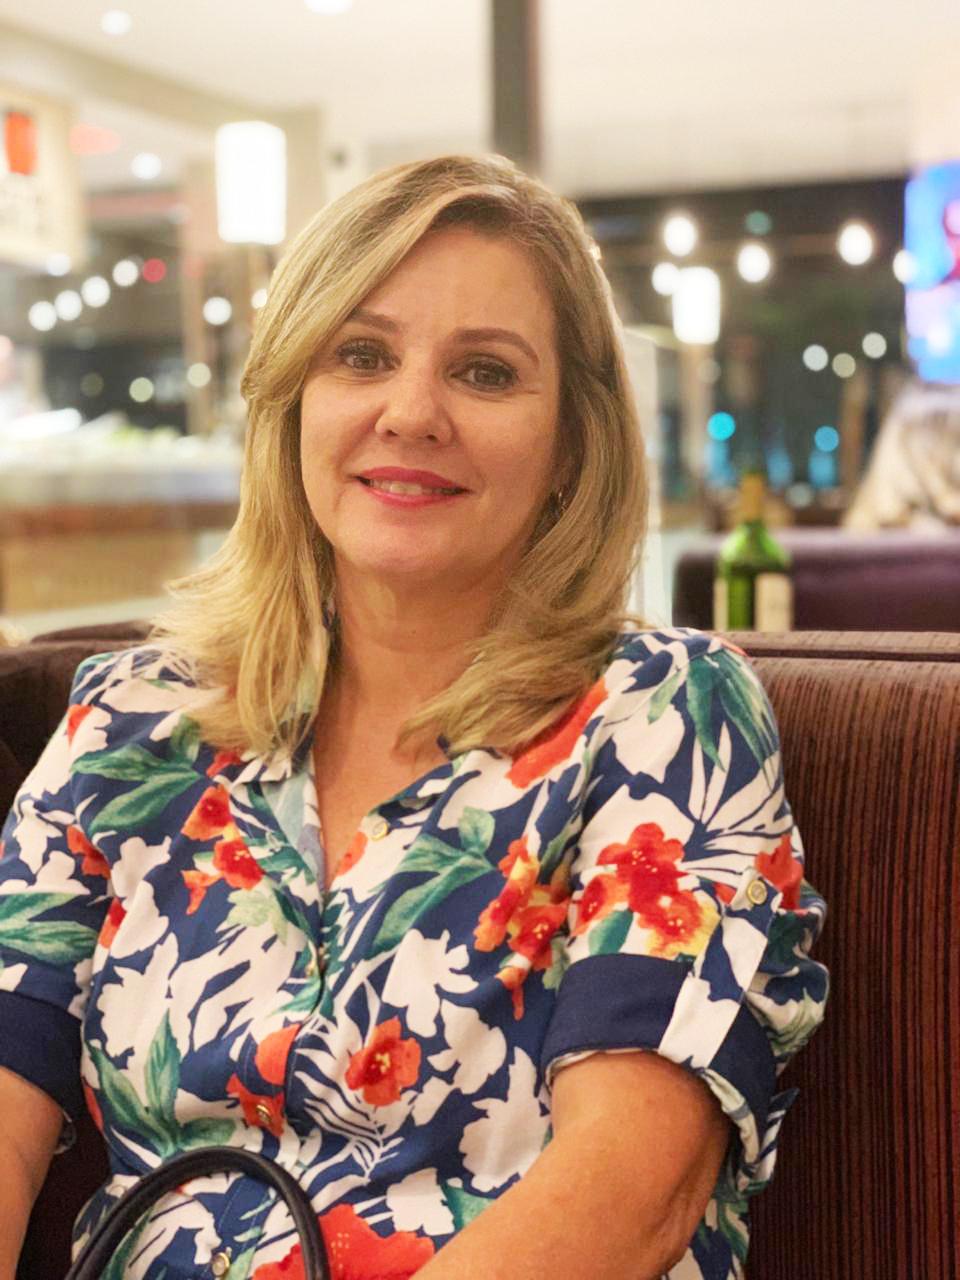 Cinthia Gil